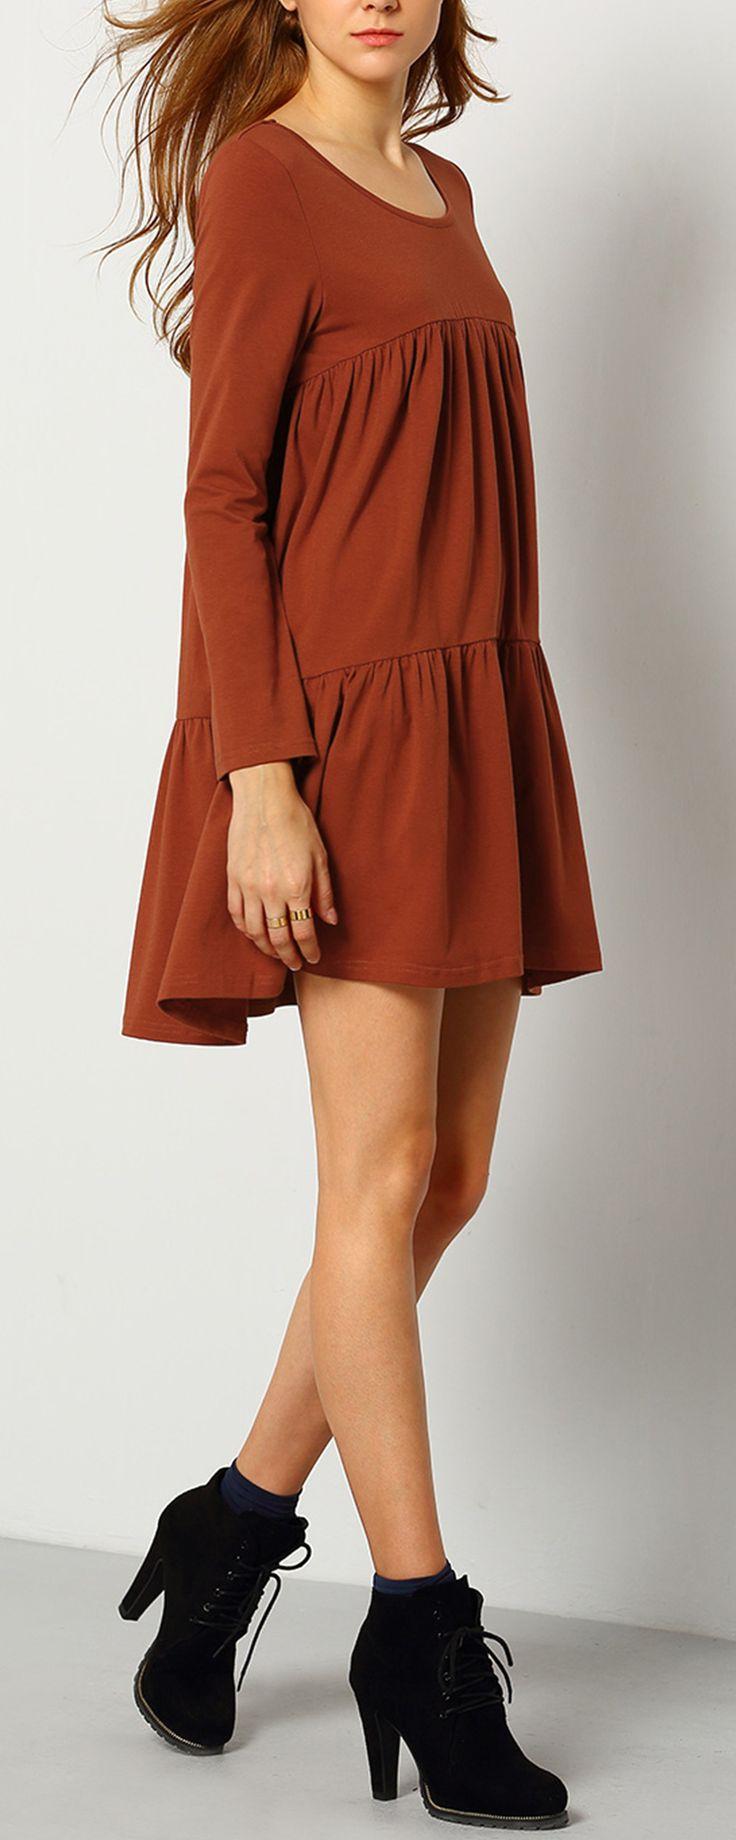 Orange Long Sleeve Casual Dress - Fashion Clothing, Latest Street Fashion At m.shein.com